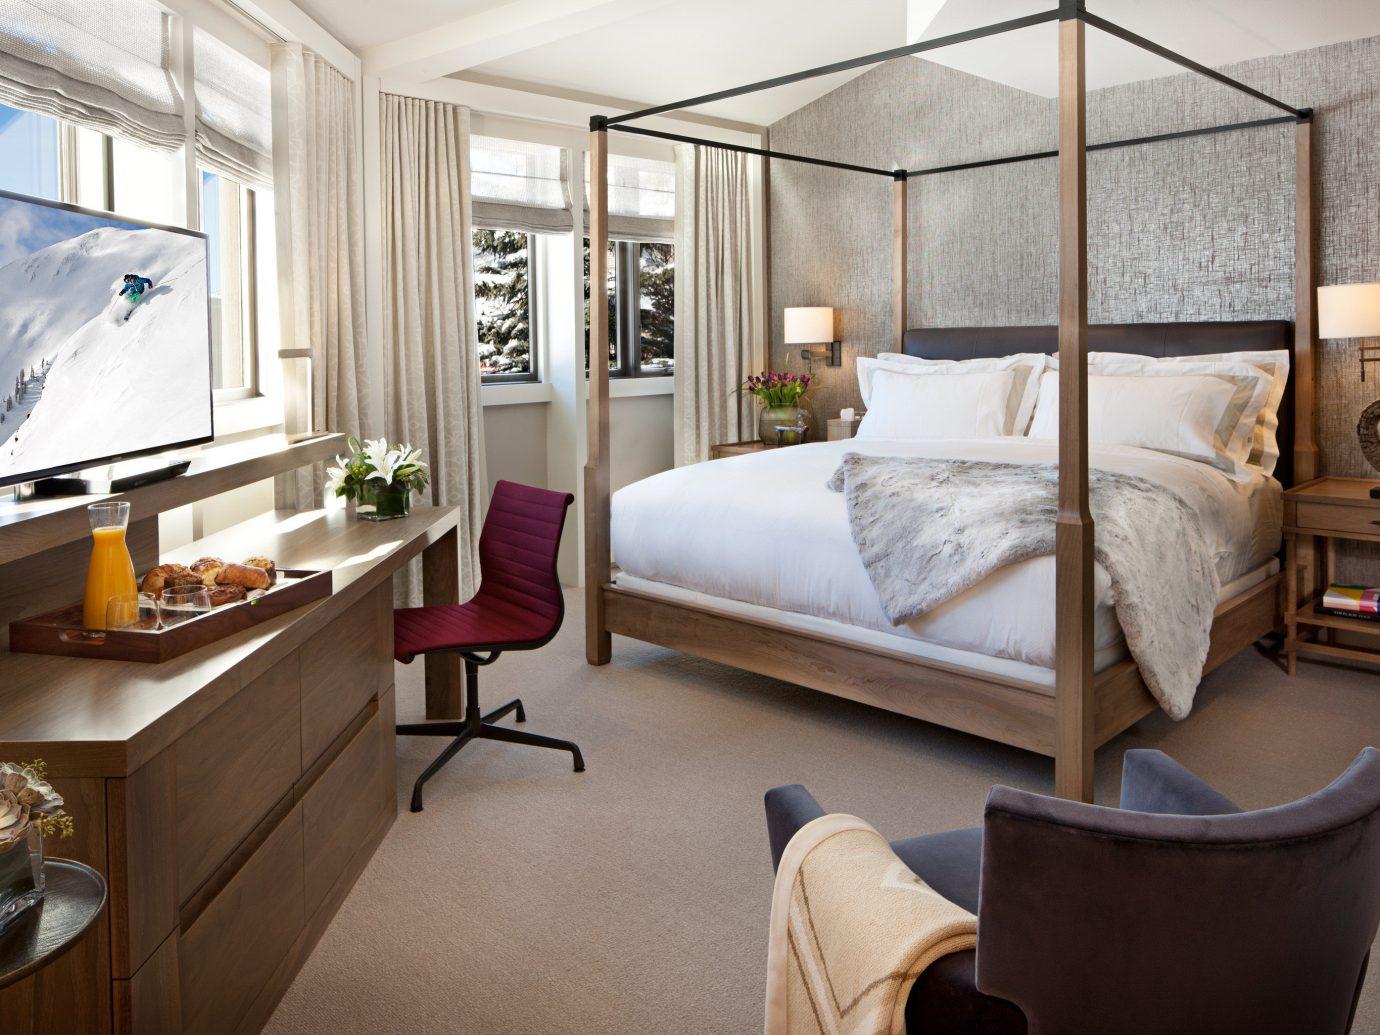 Bedroom Celebs Hotels Modern Scenic views Trip Ideas indoor floor wall room window property living room home estate Suite interior design real estate cottage Design condominium apartment furniture